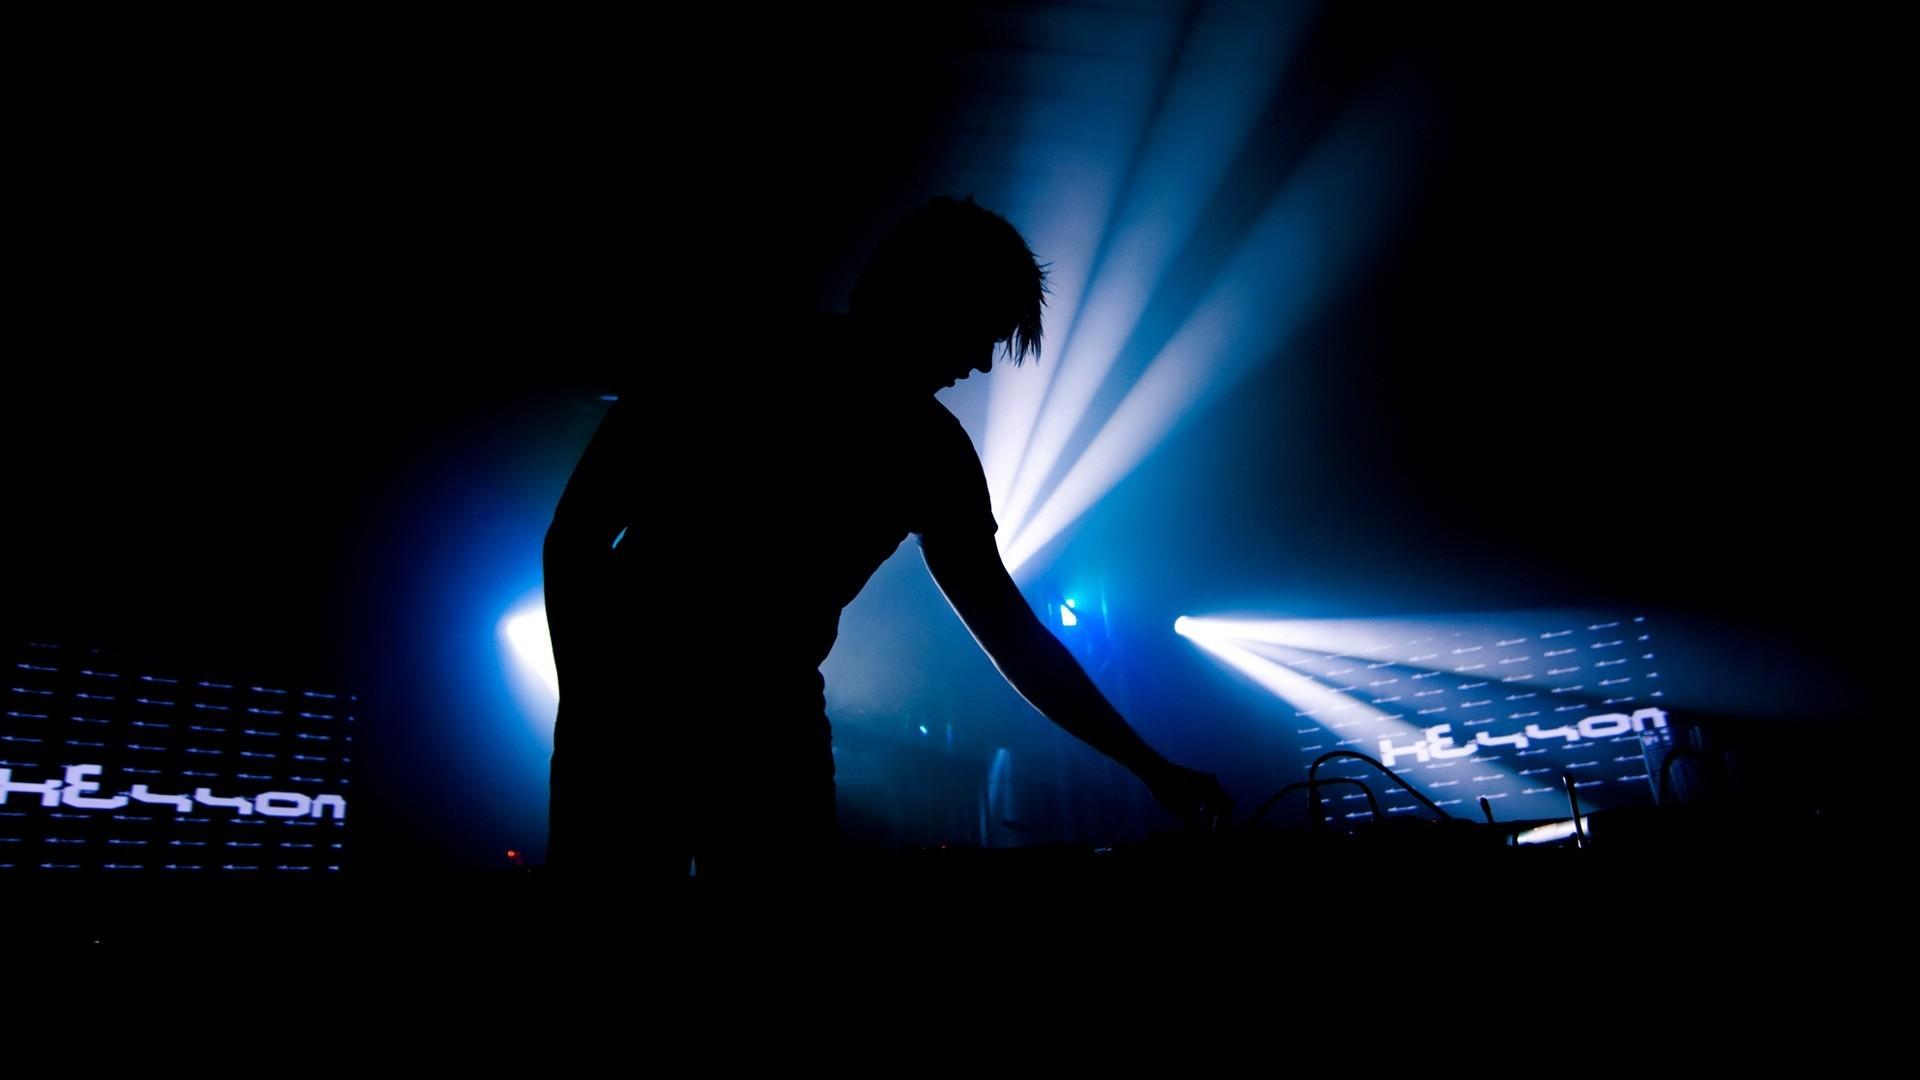 People 1920x1080 music DJ men blue